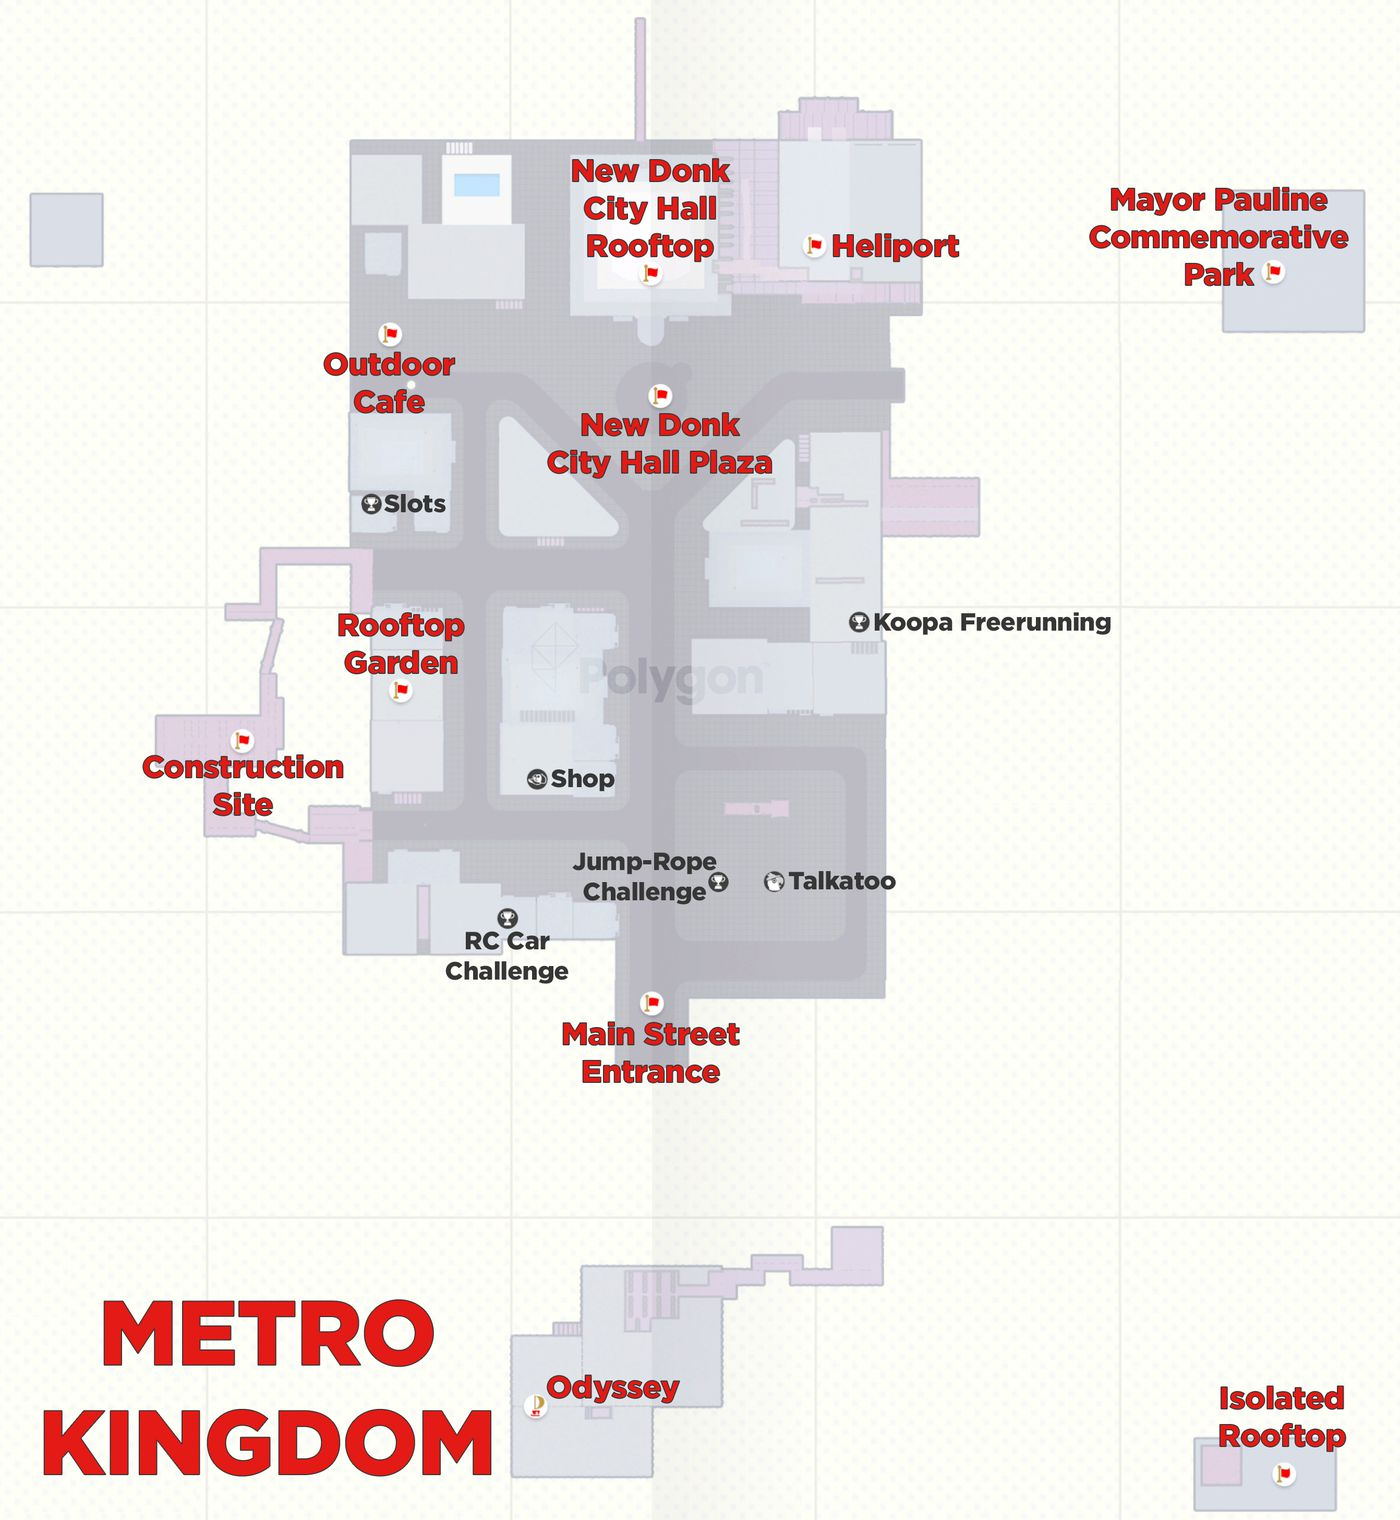 New York Subway Map Hide Head.Super Mario Odyssey Guide Metro Kingdom All Power Moon Locations